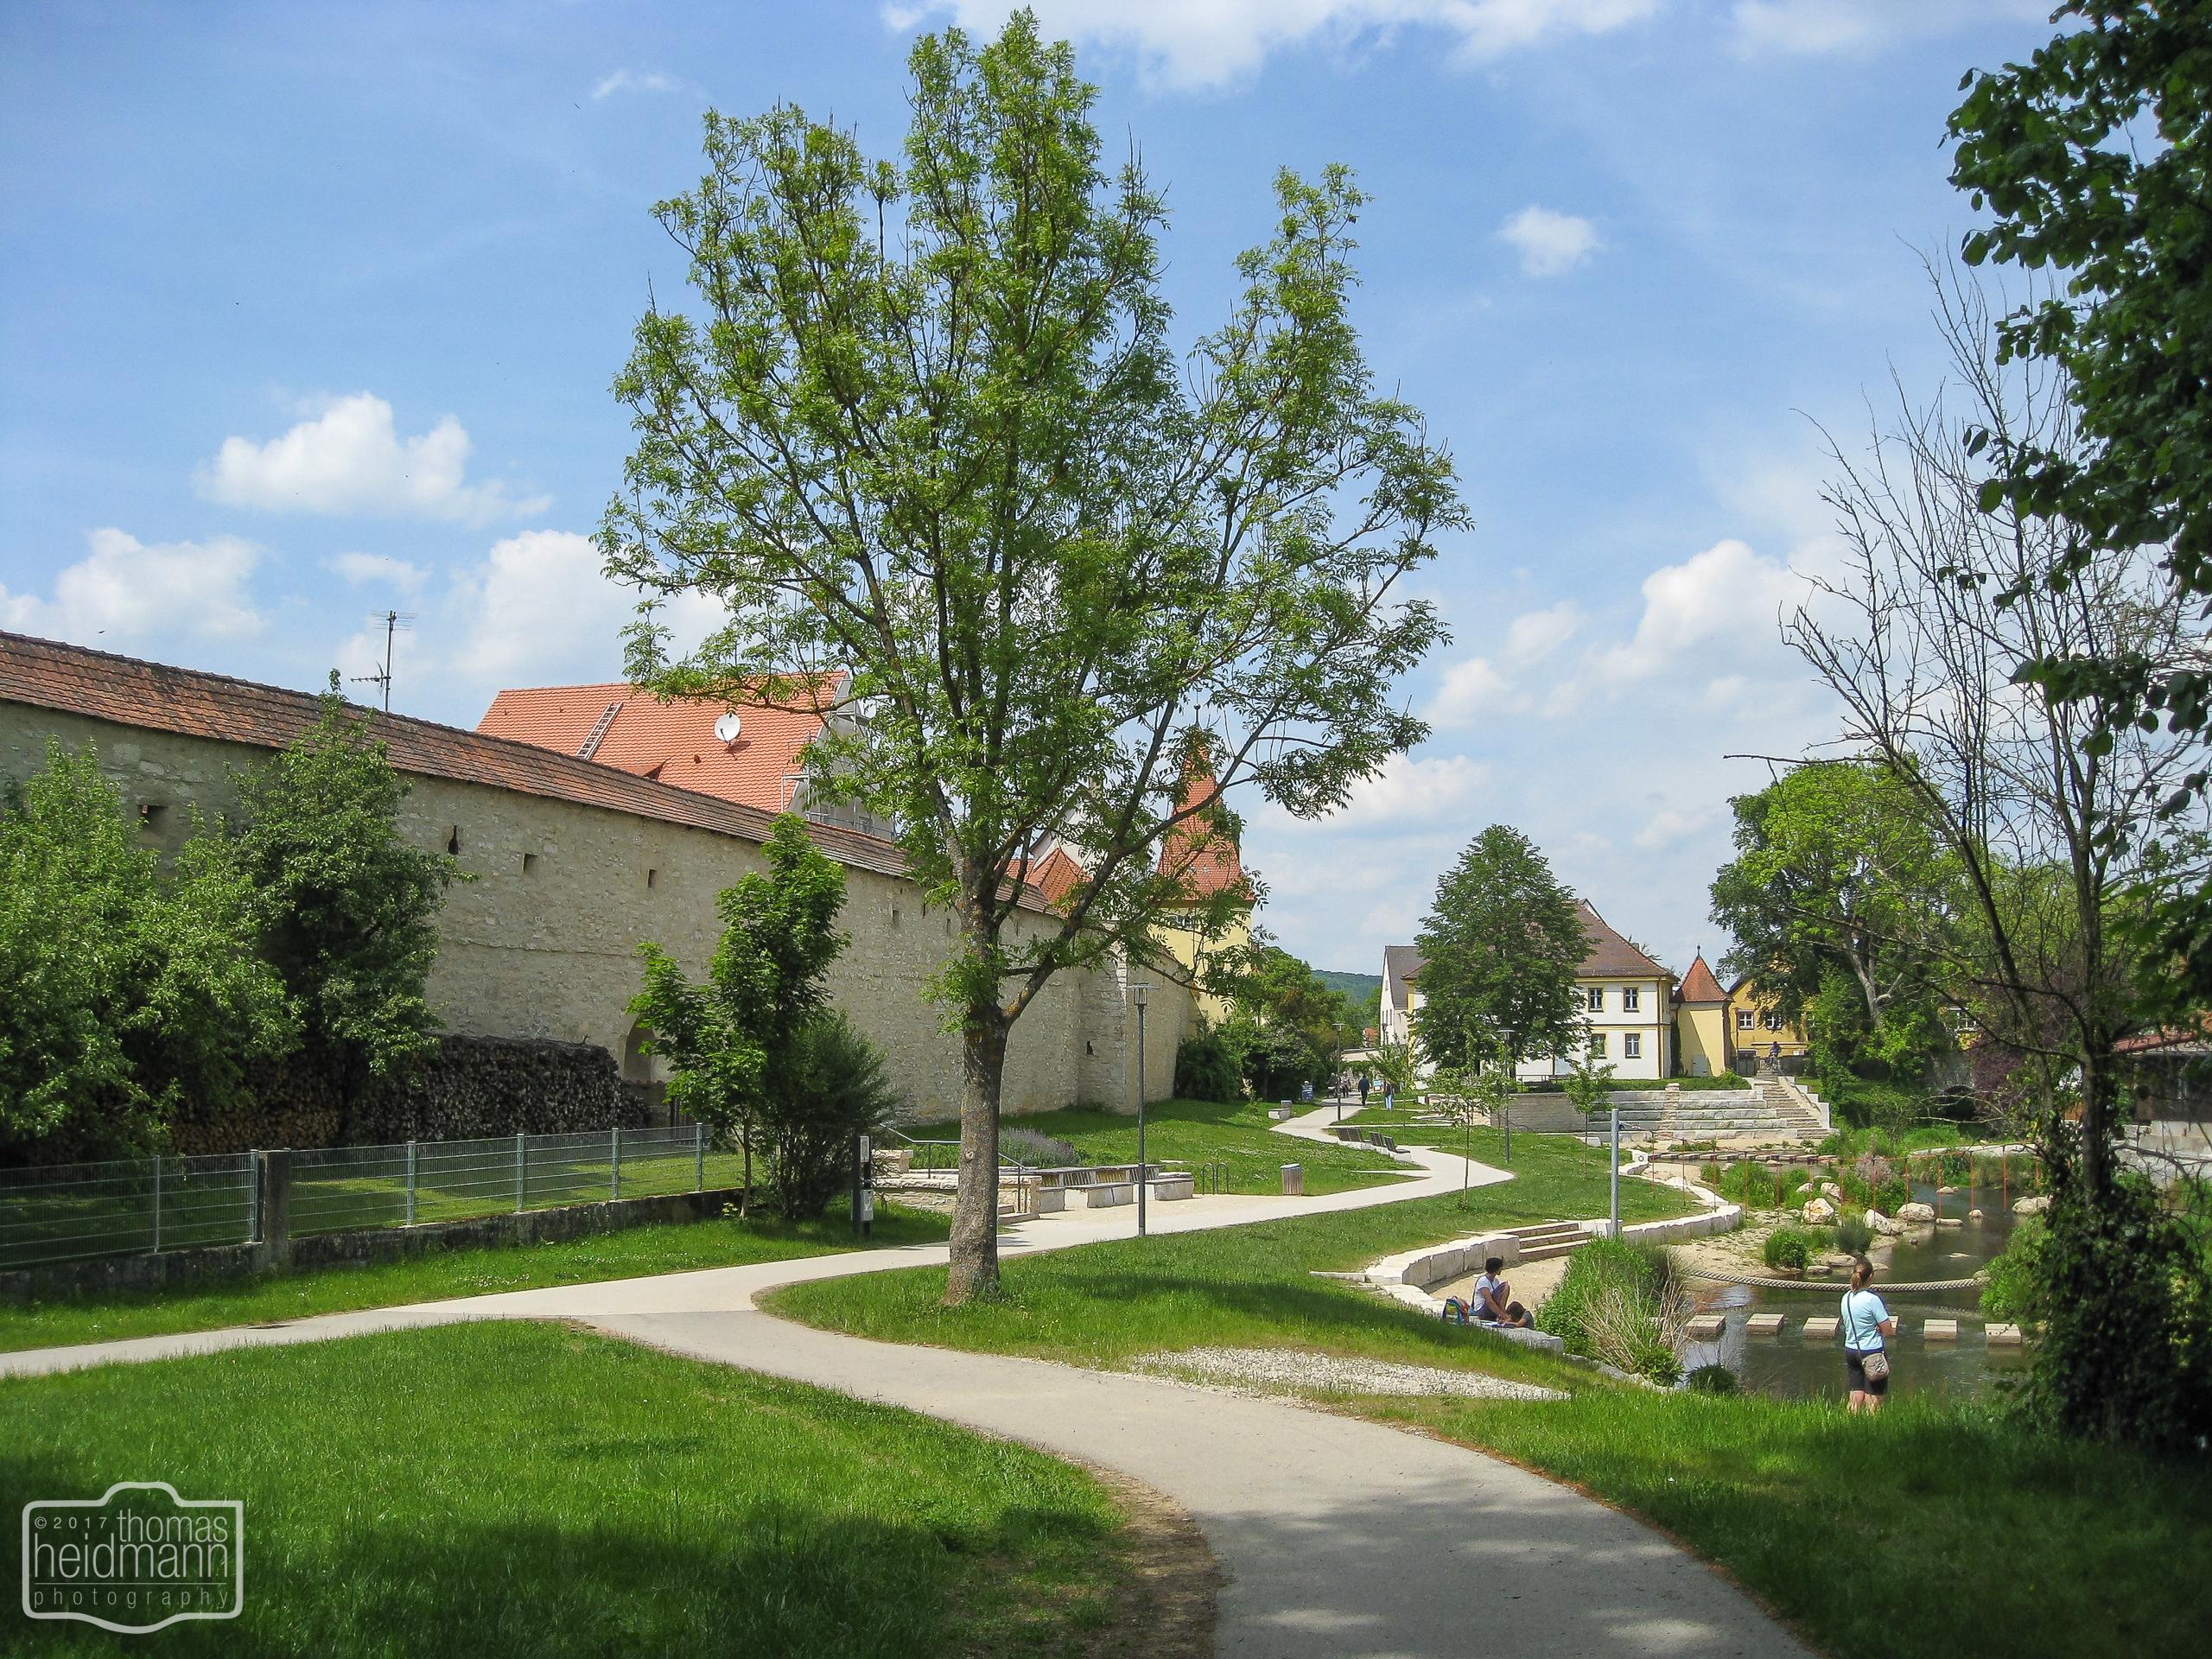 Berching am Main-Donaukanal